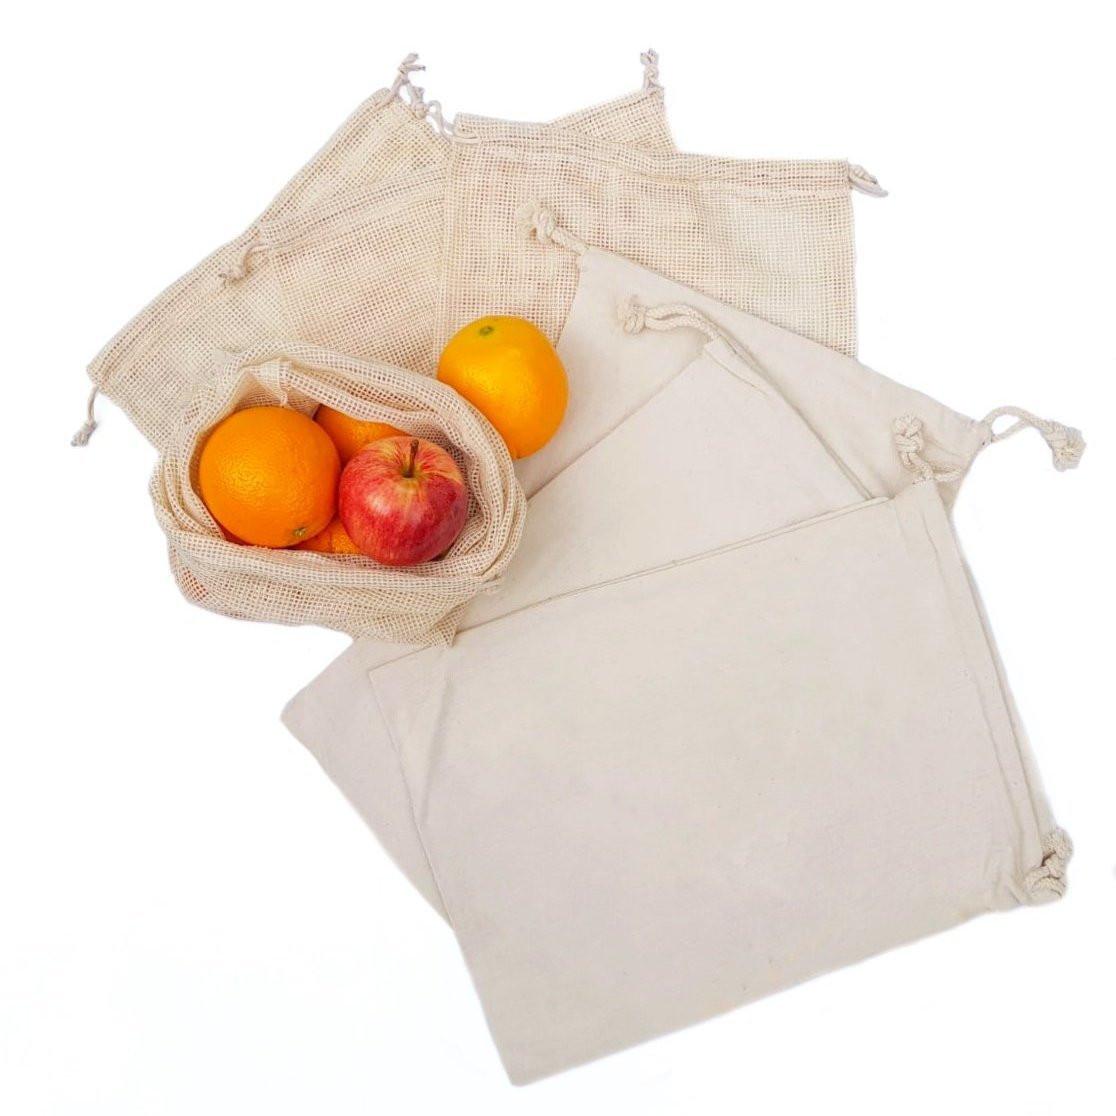 Reusable Organic Cotton Produce Bags